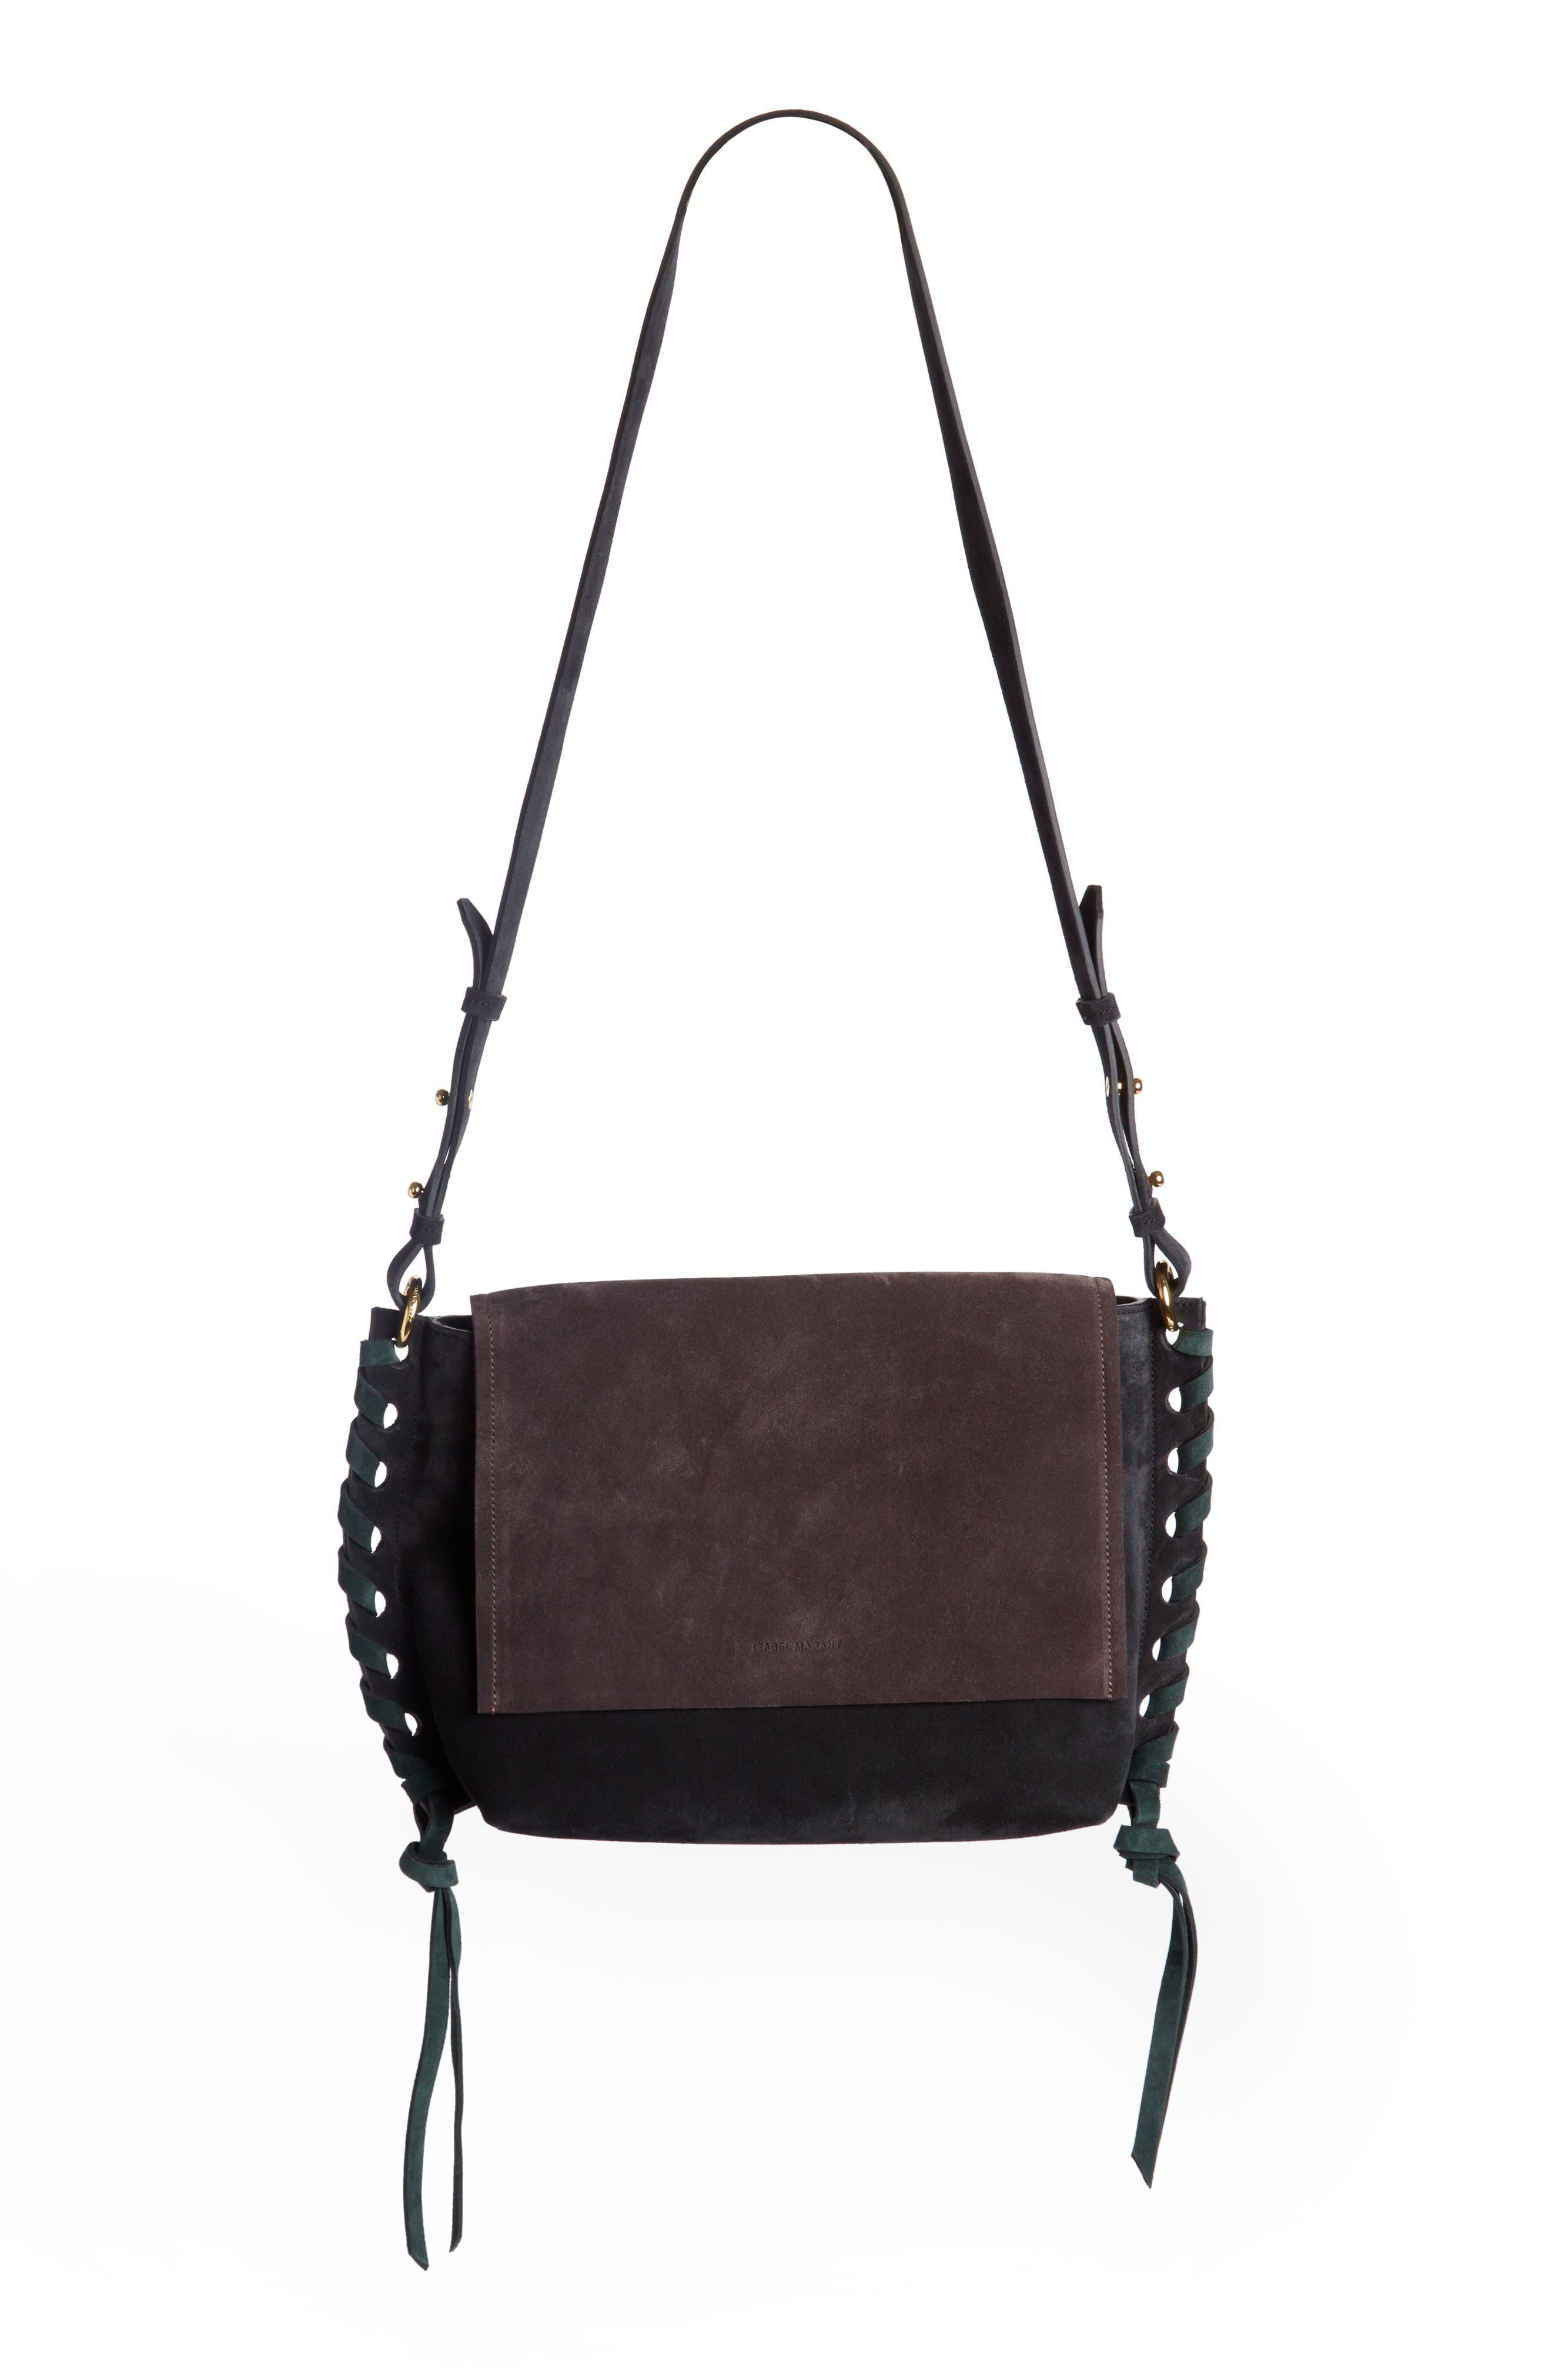 Asli Colorblock Suede Shoulder Bag,                             Main thumbnail 1, color,                             002